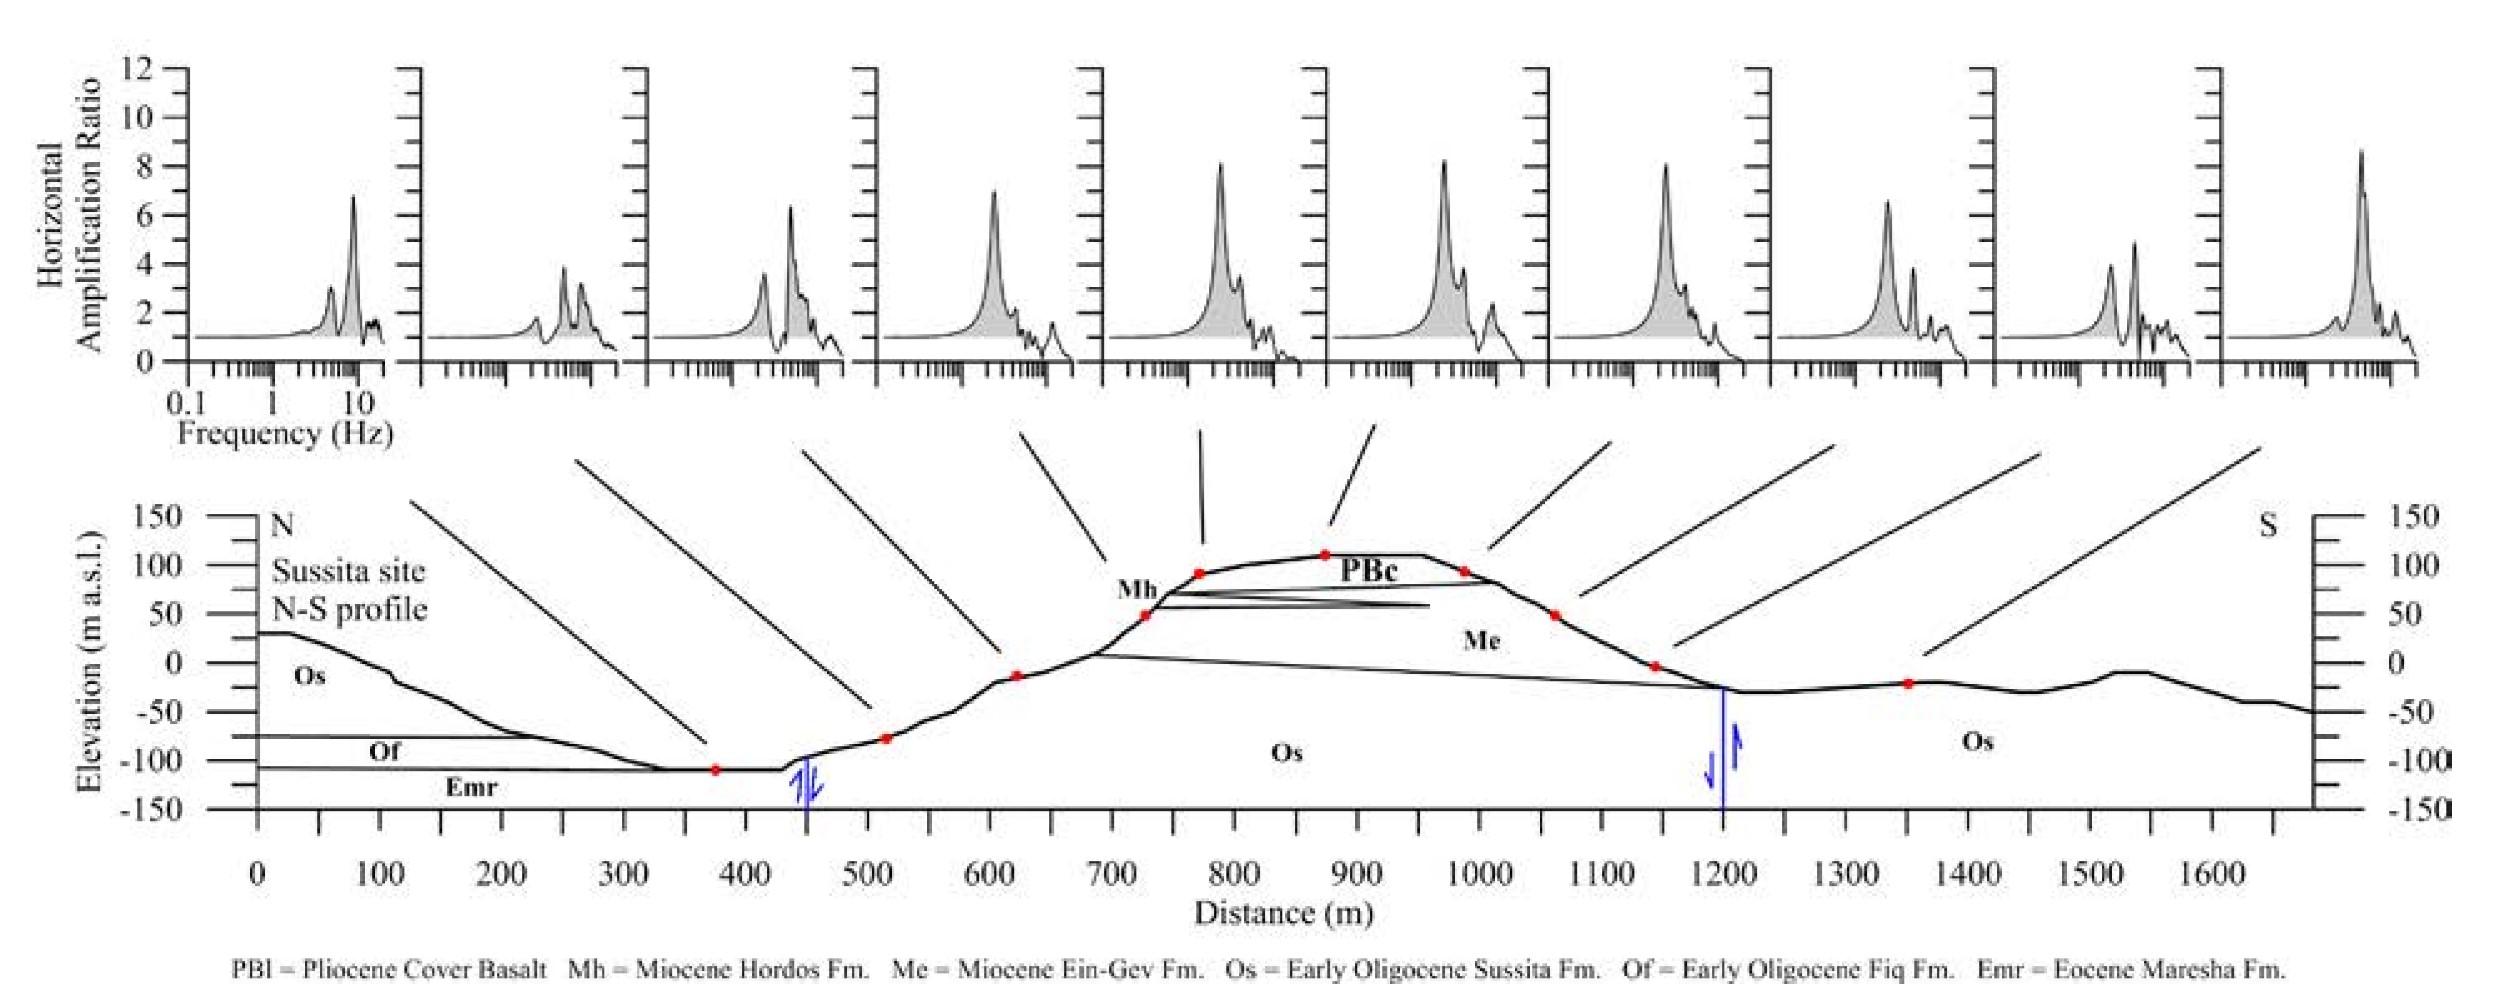 Topographic or Ridge Effect at Hippos Sussita